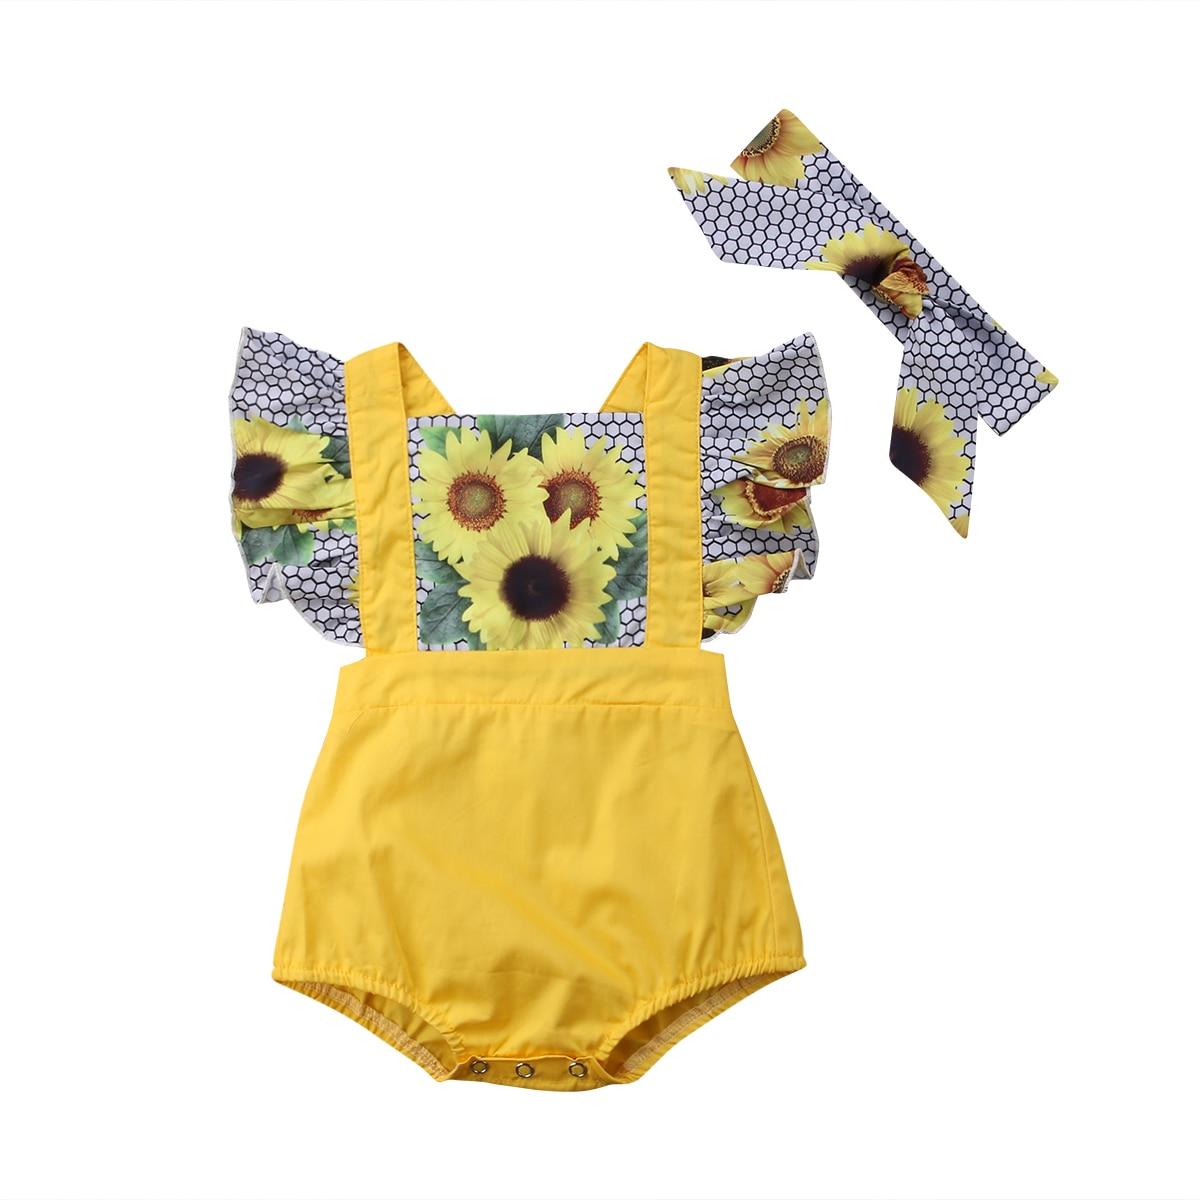 2018 Nette Neugeborenes Sunflower Bodysuit Tupfen Süße Sommer Overall Sunsuit Outfit Set